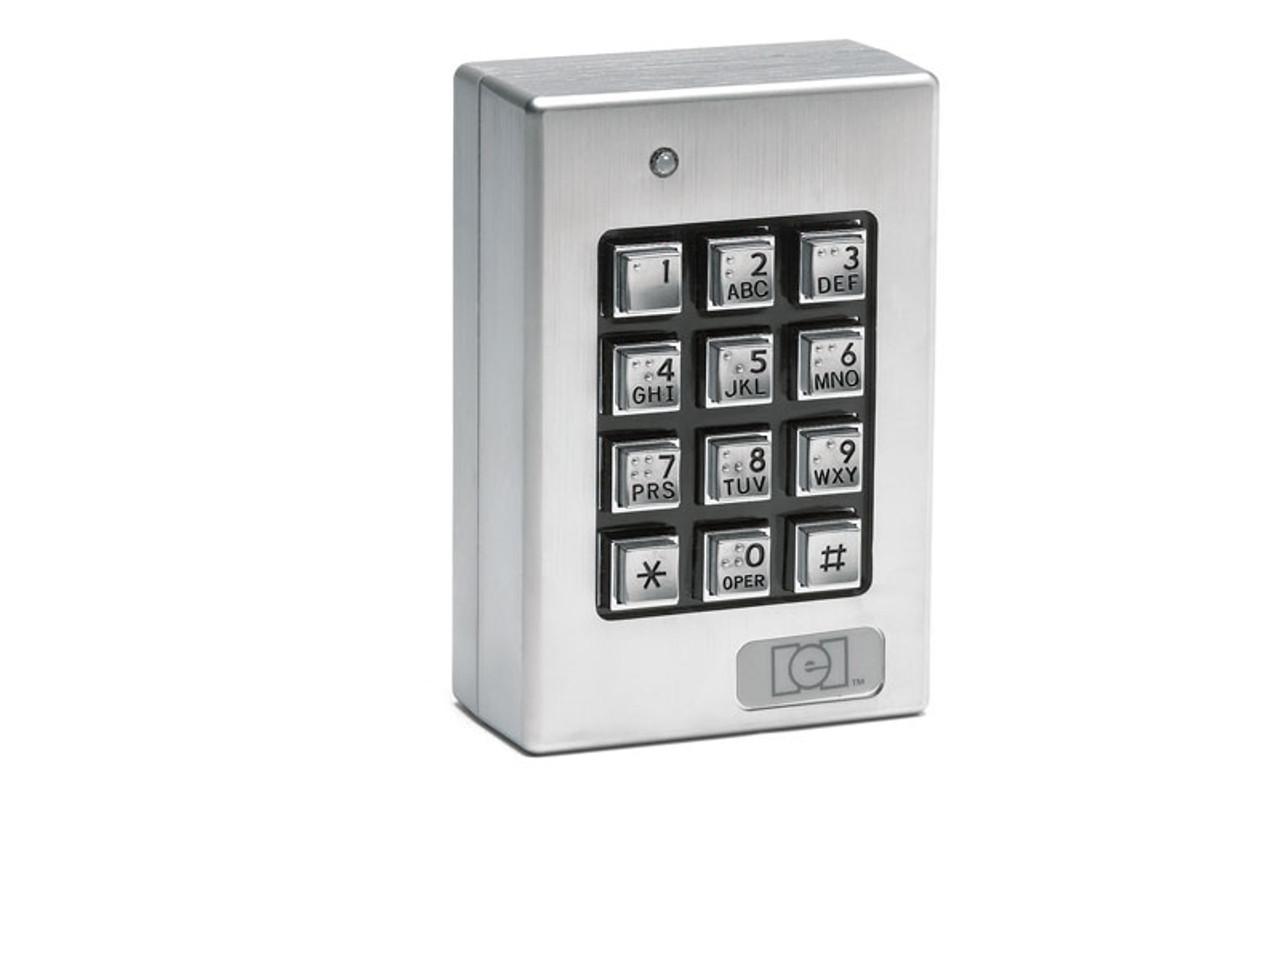 Linear IEI 212i Indoor Flush-mount Keypad Stand-alone Access Control Keypad